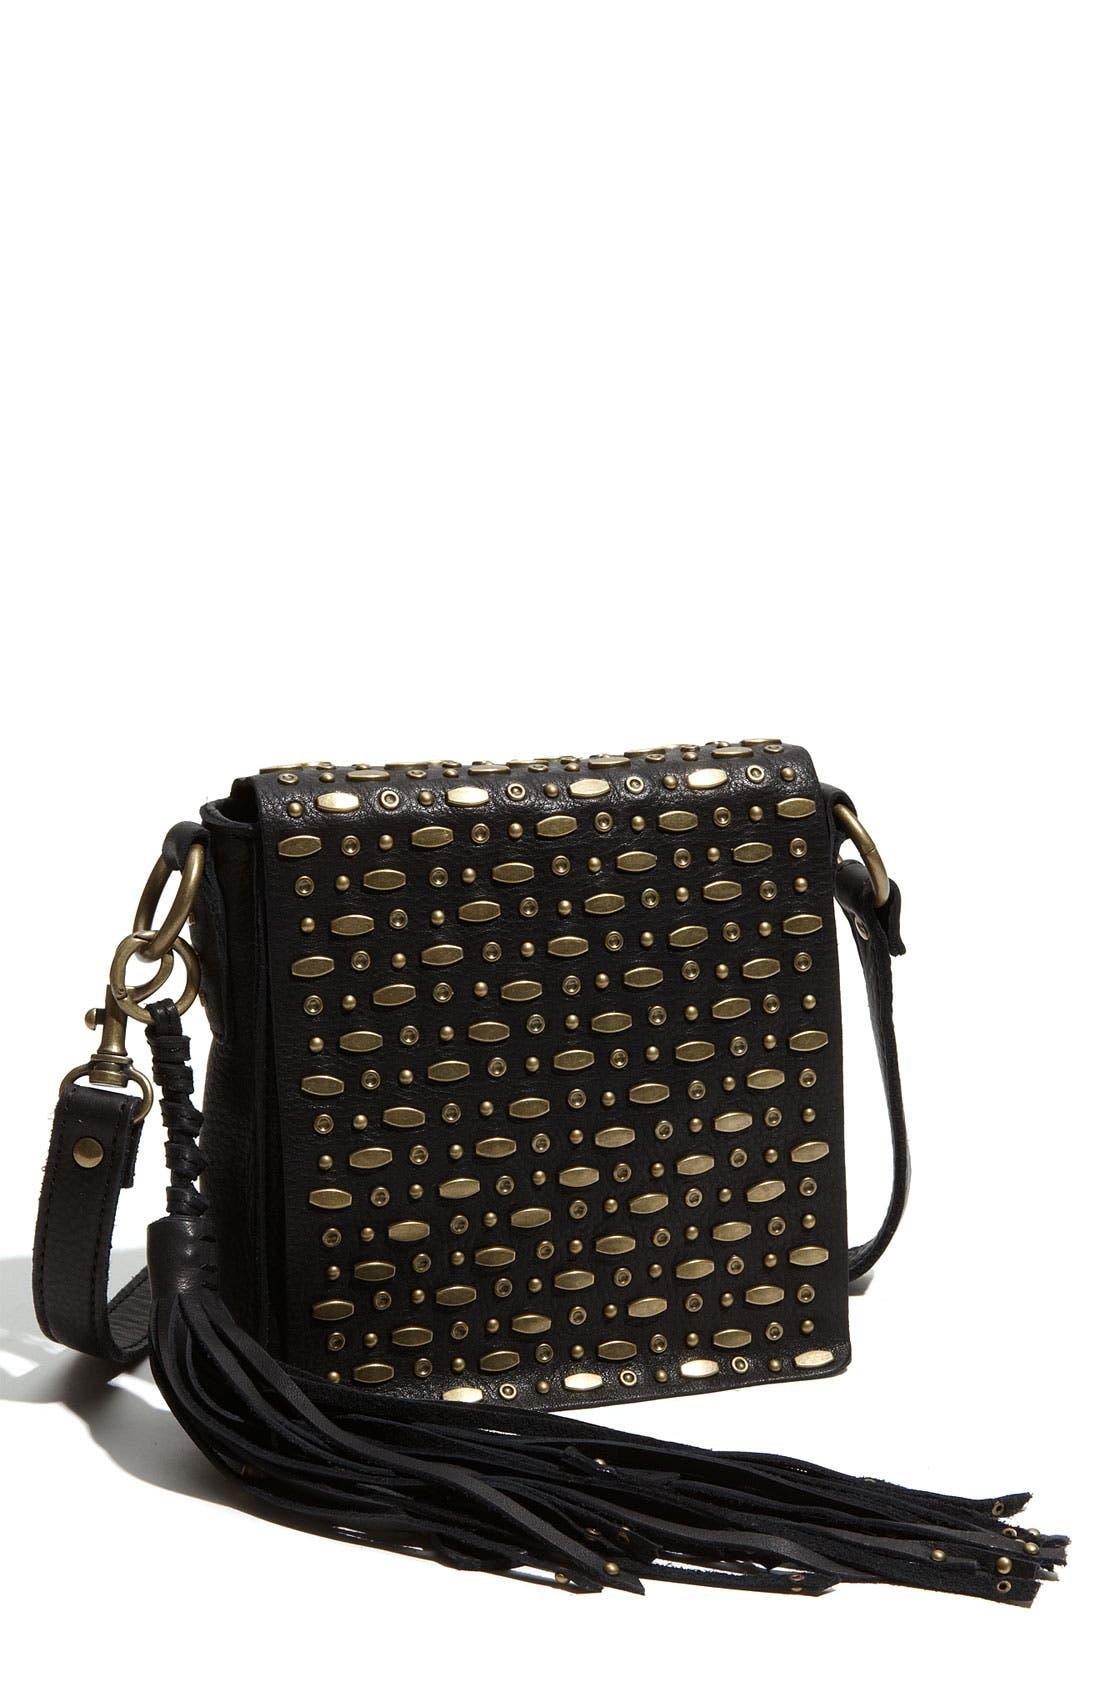 Alternate Image 1 Selected - Revel NY 'Nolita' Crossbody Flap Bag